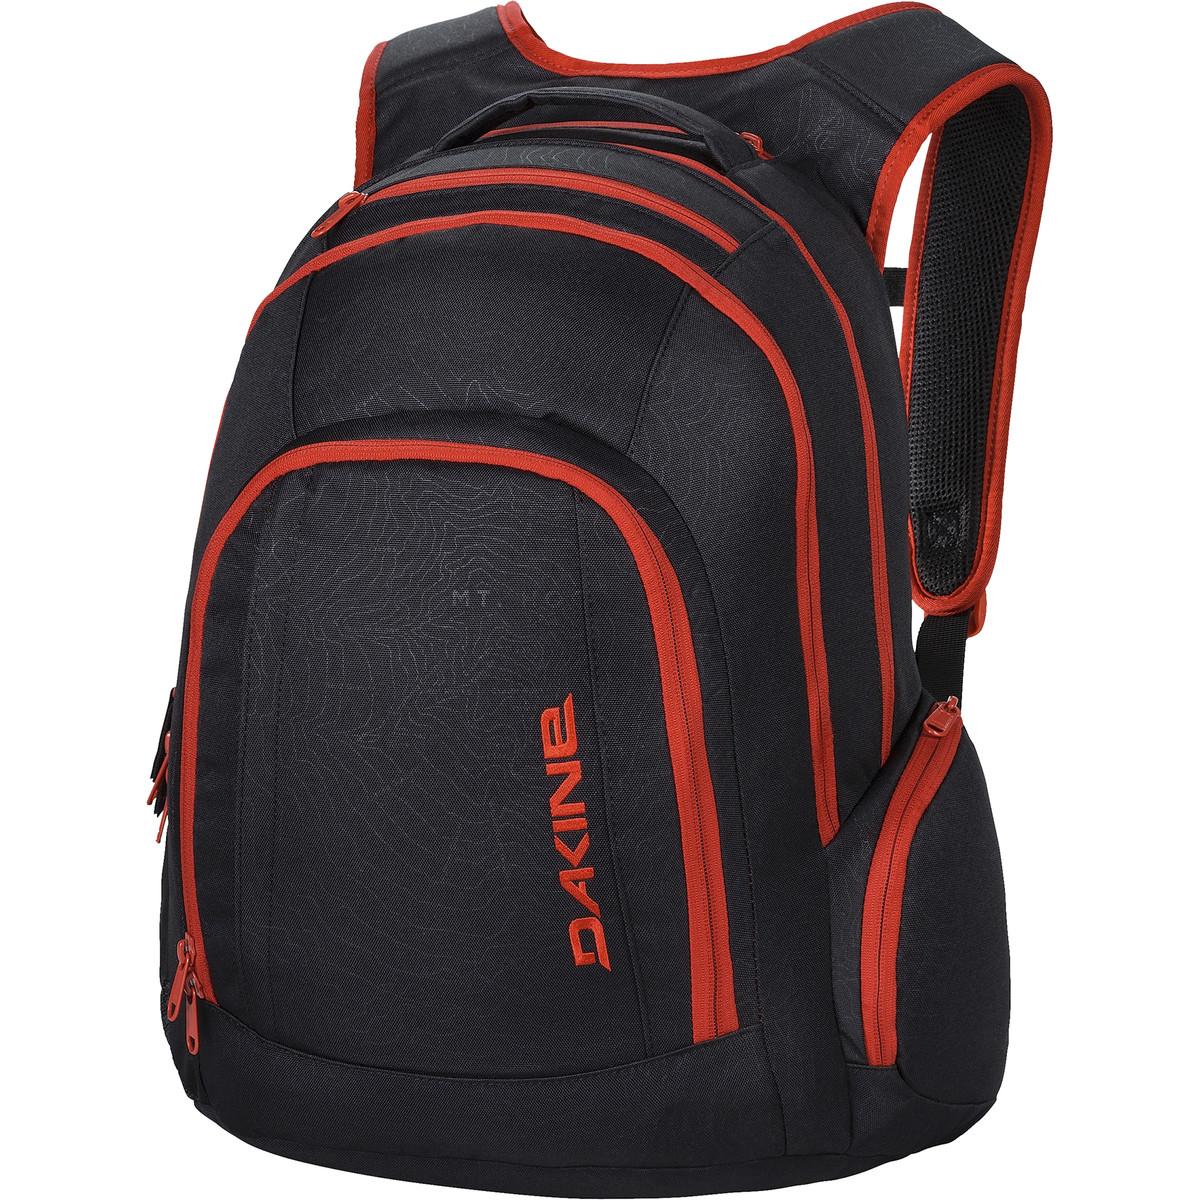 DaKine 101 Pack